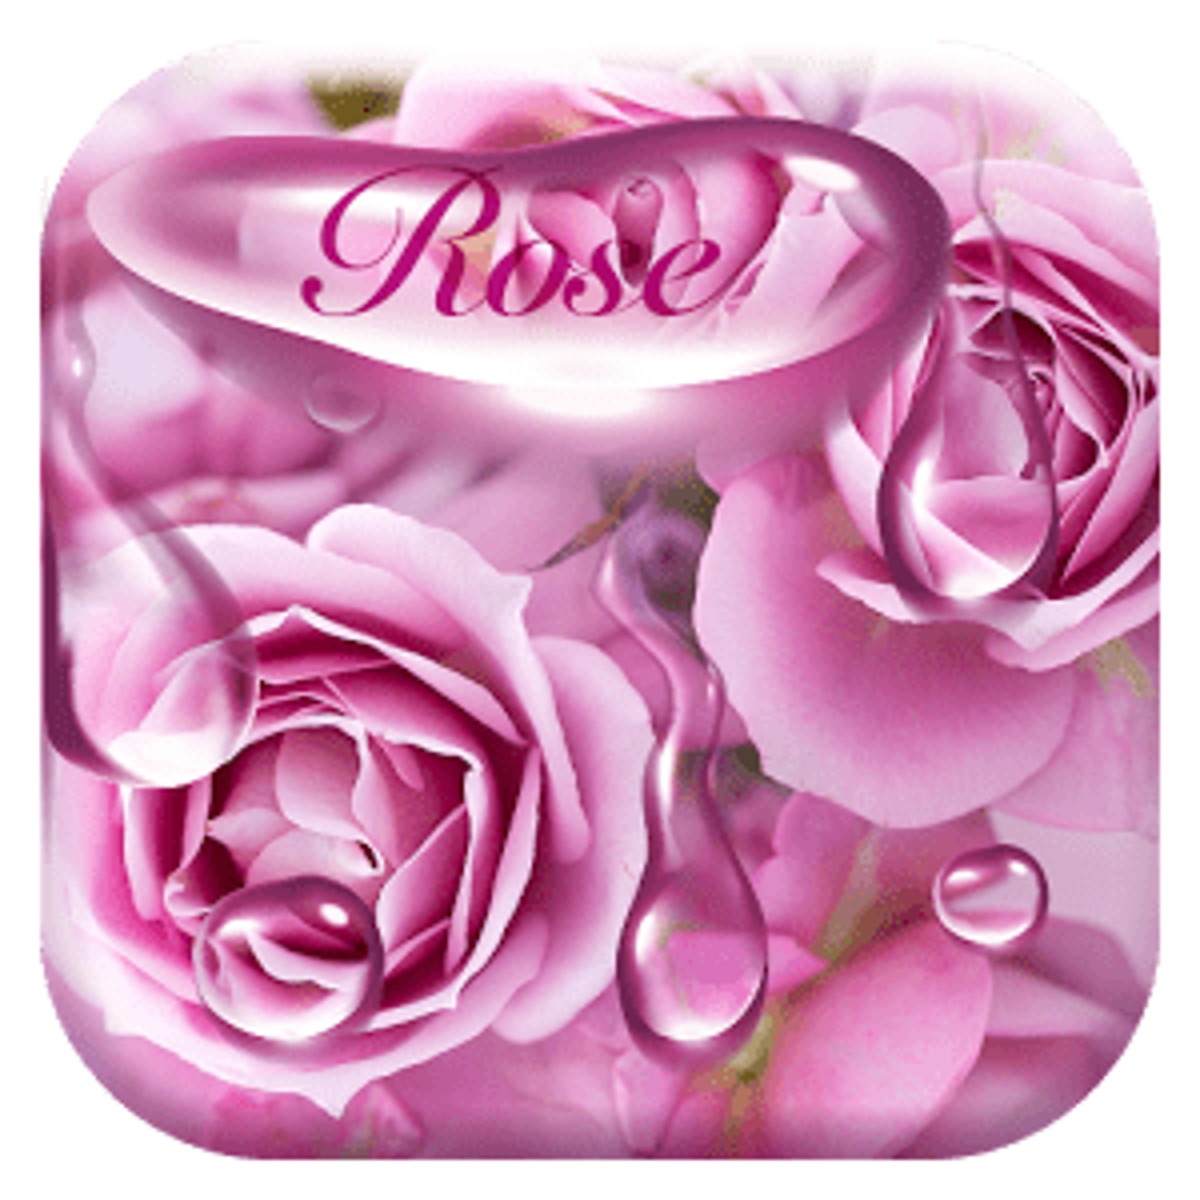 Rose waterdrops keyboard 10001002